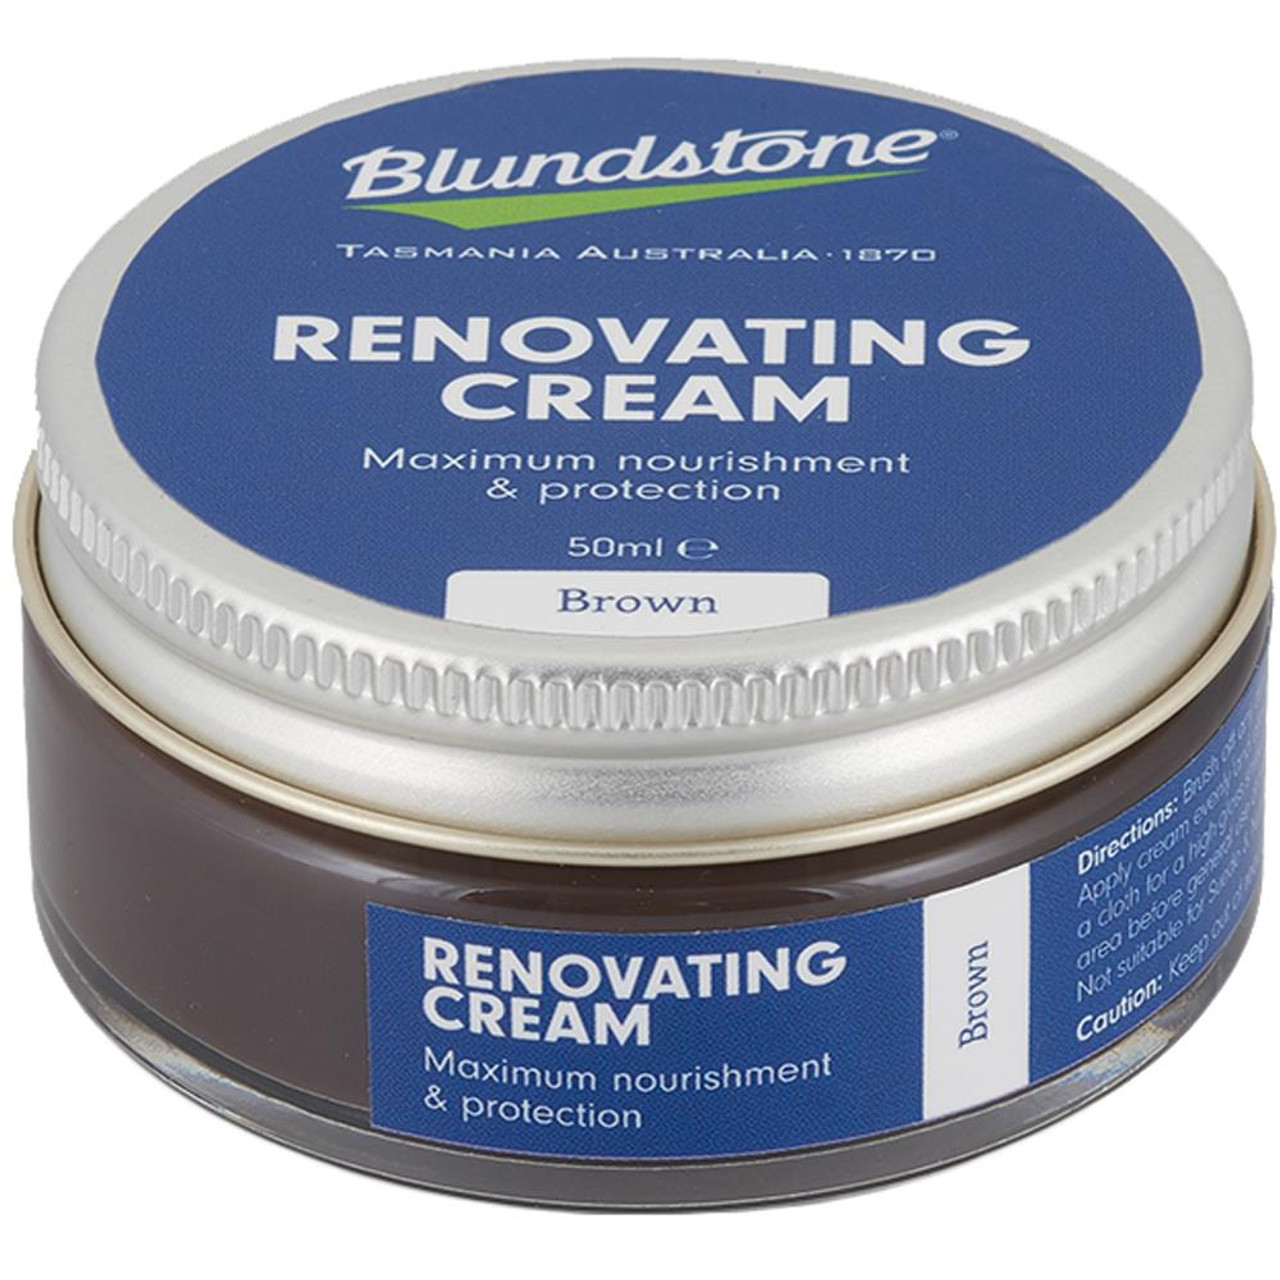 Blundstone Renovating Cream Brown